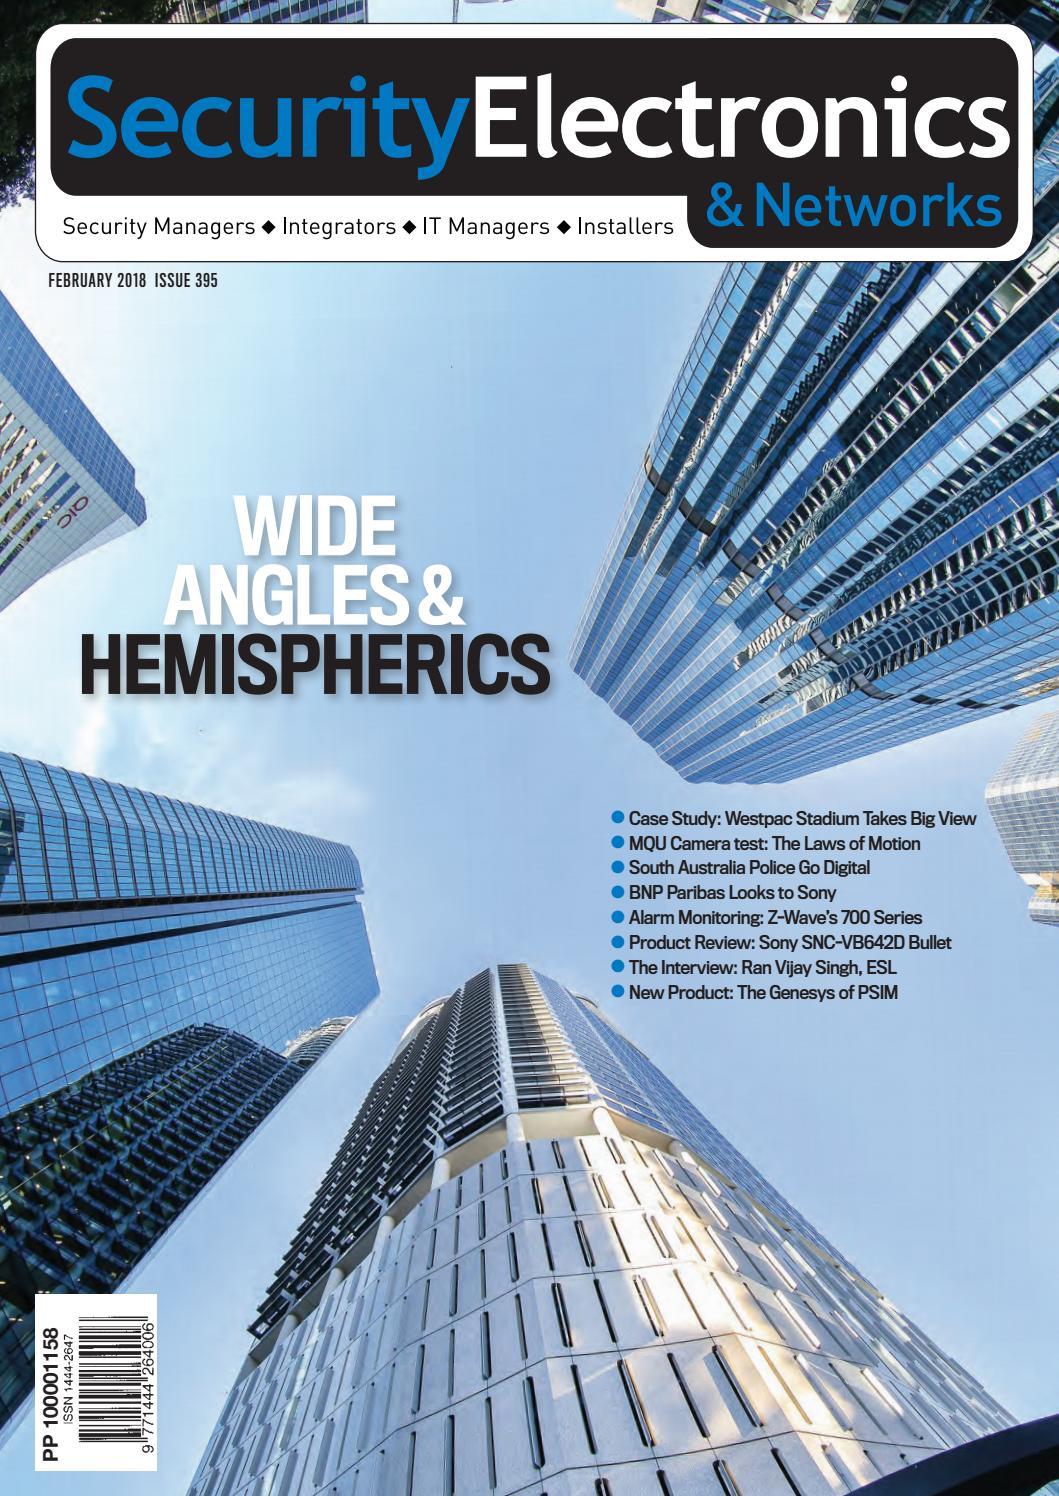 e77c1dac49 Sen feb18 by Security Electronics & Networks Magazine - issuu